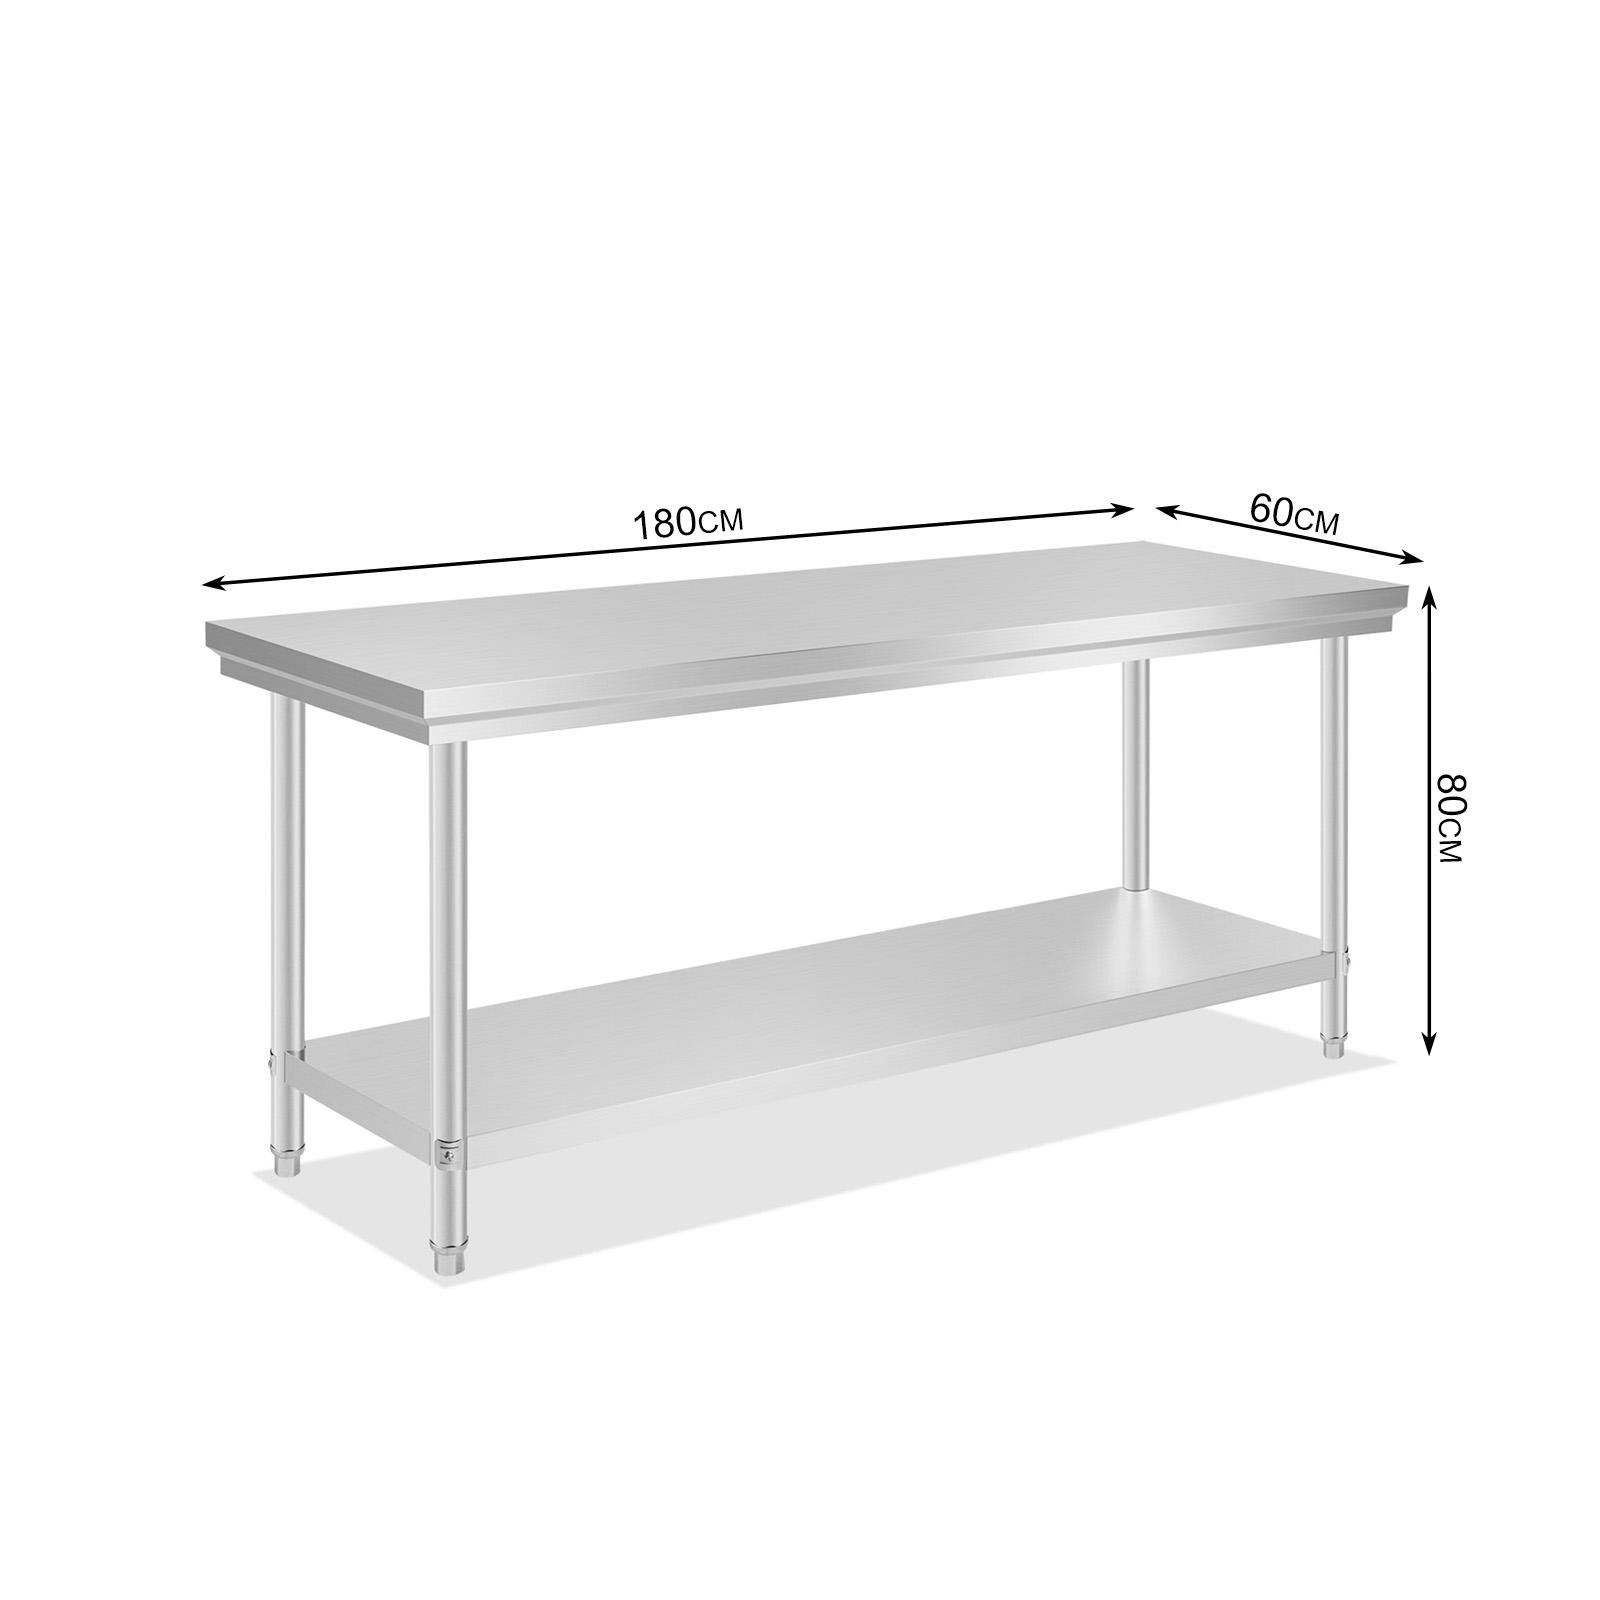 stainless steel mercial food prep work bench office table ebay